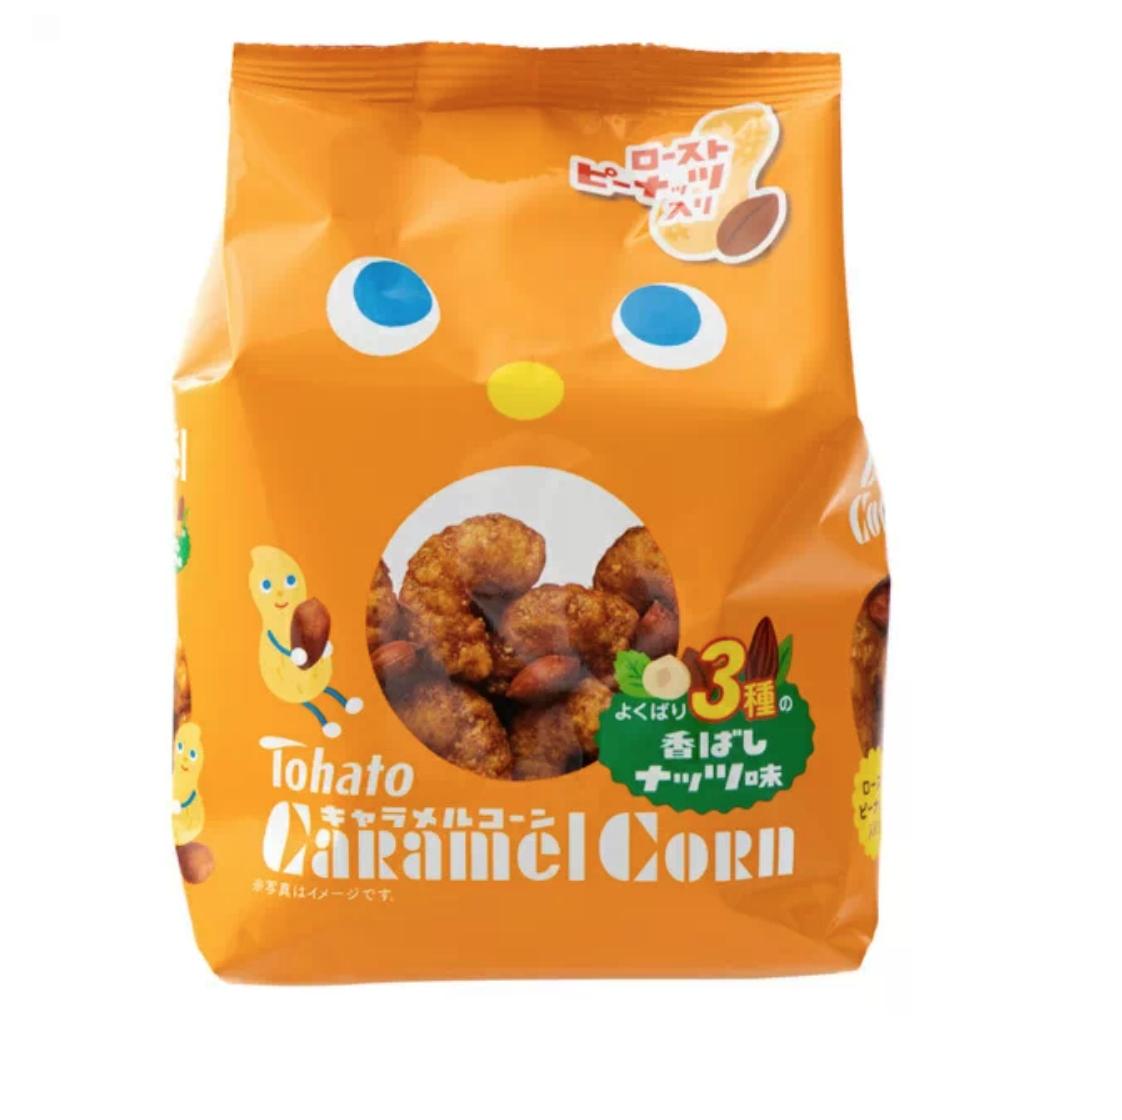 Tohato Tohato Caramel Corn (Chocolate Flavour)